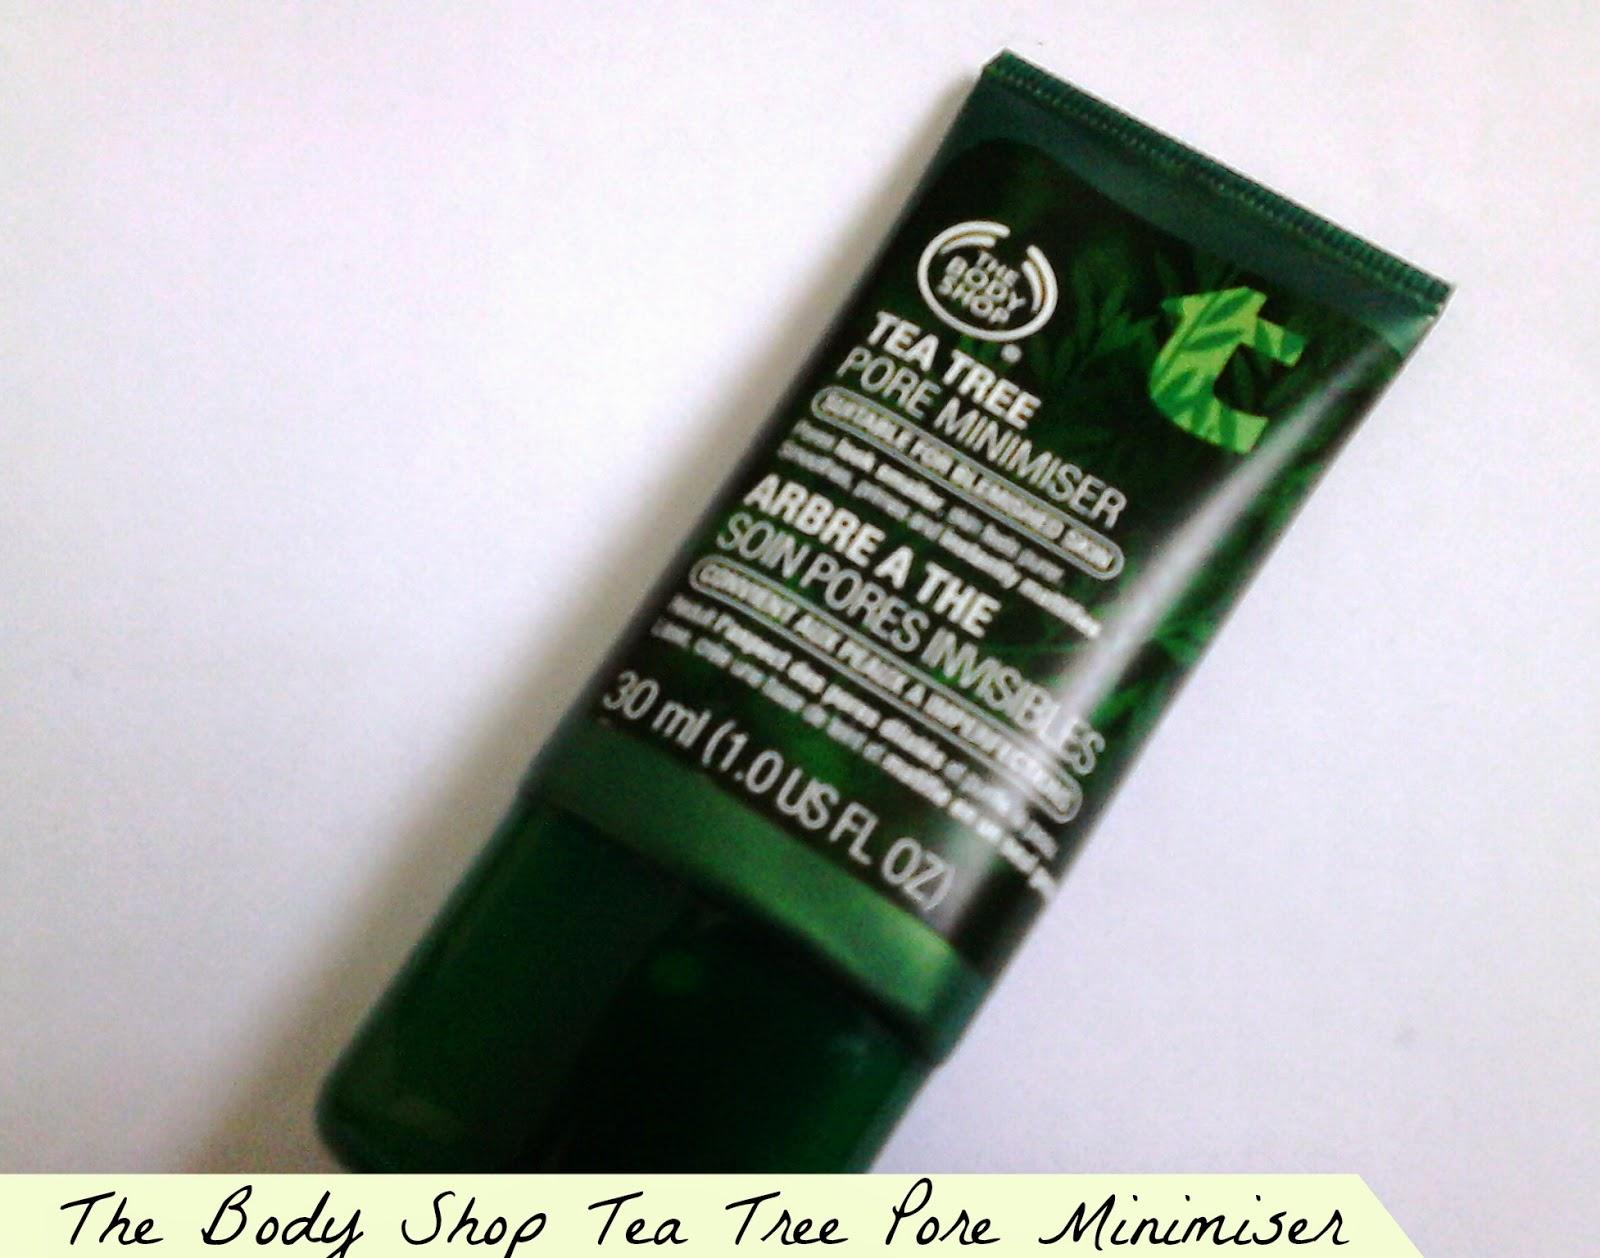 The Bodyshop Tea Tree Pore Minimiser